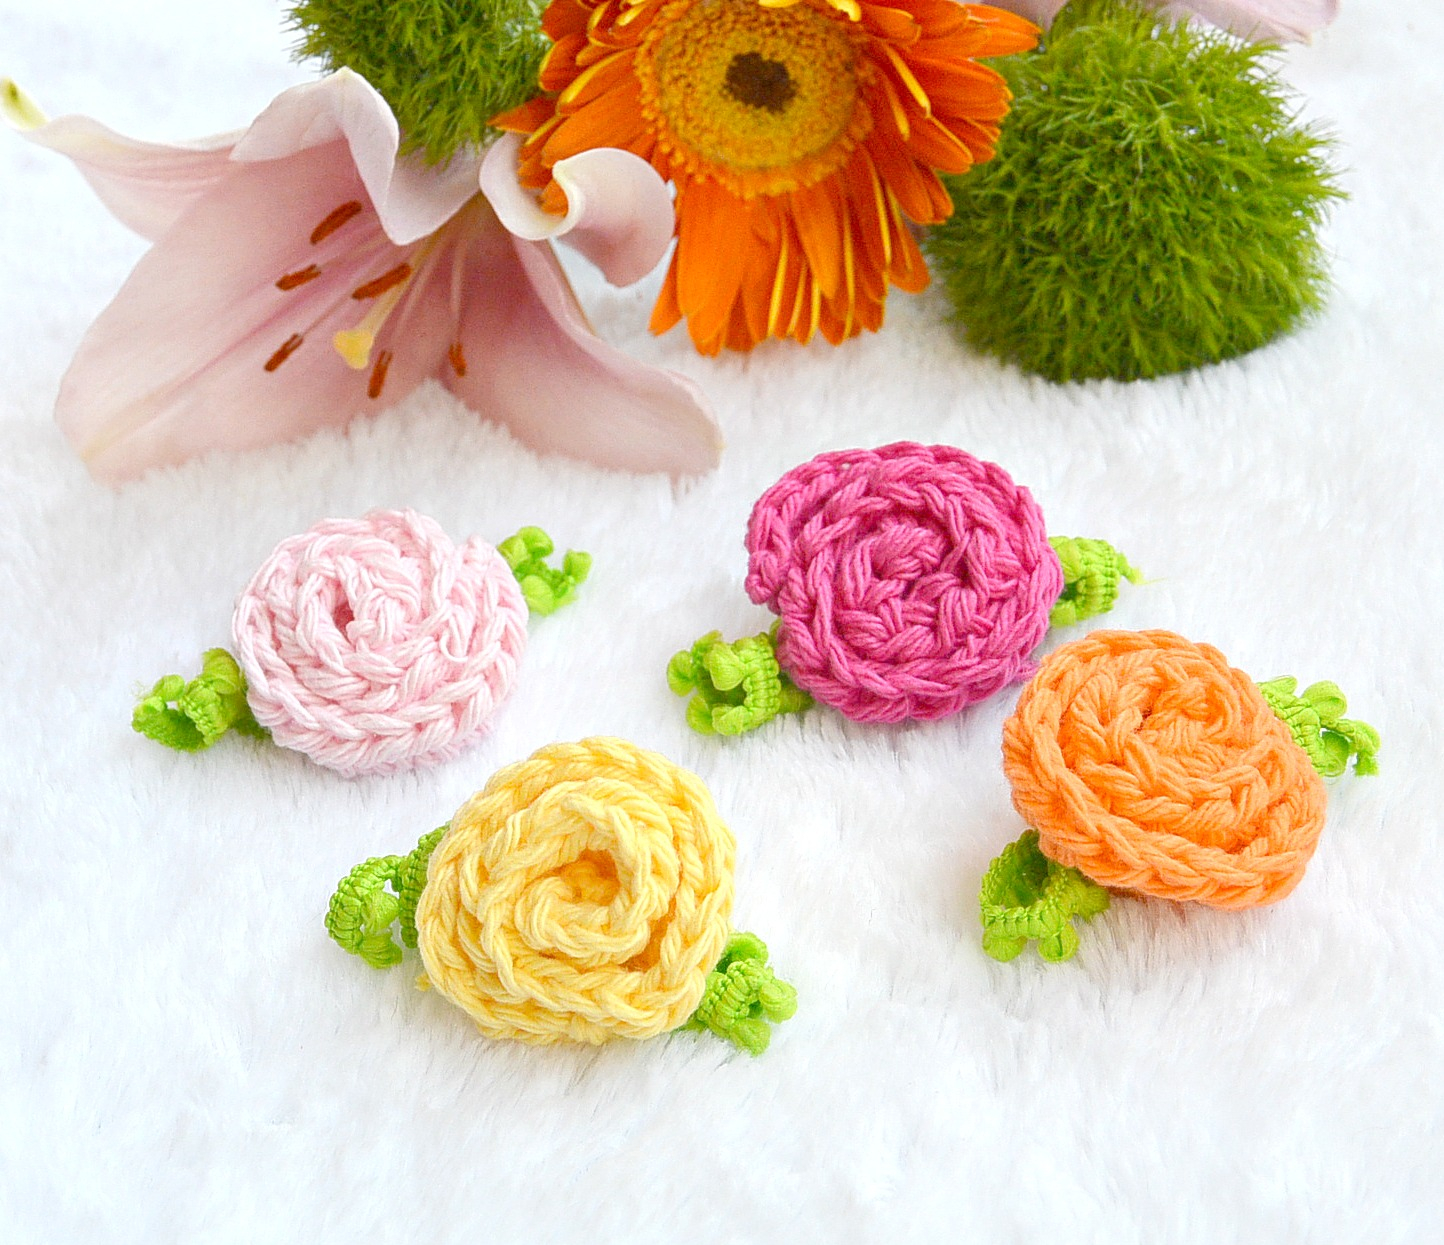 3 Inspirations of Easy Flower Crochet Pattern Sweet Daisies Free Flower Crochet Pattern Mama In A Stitch